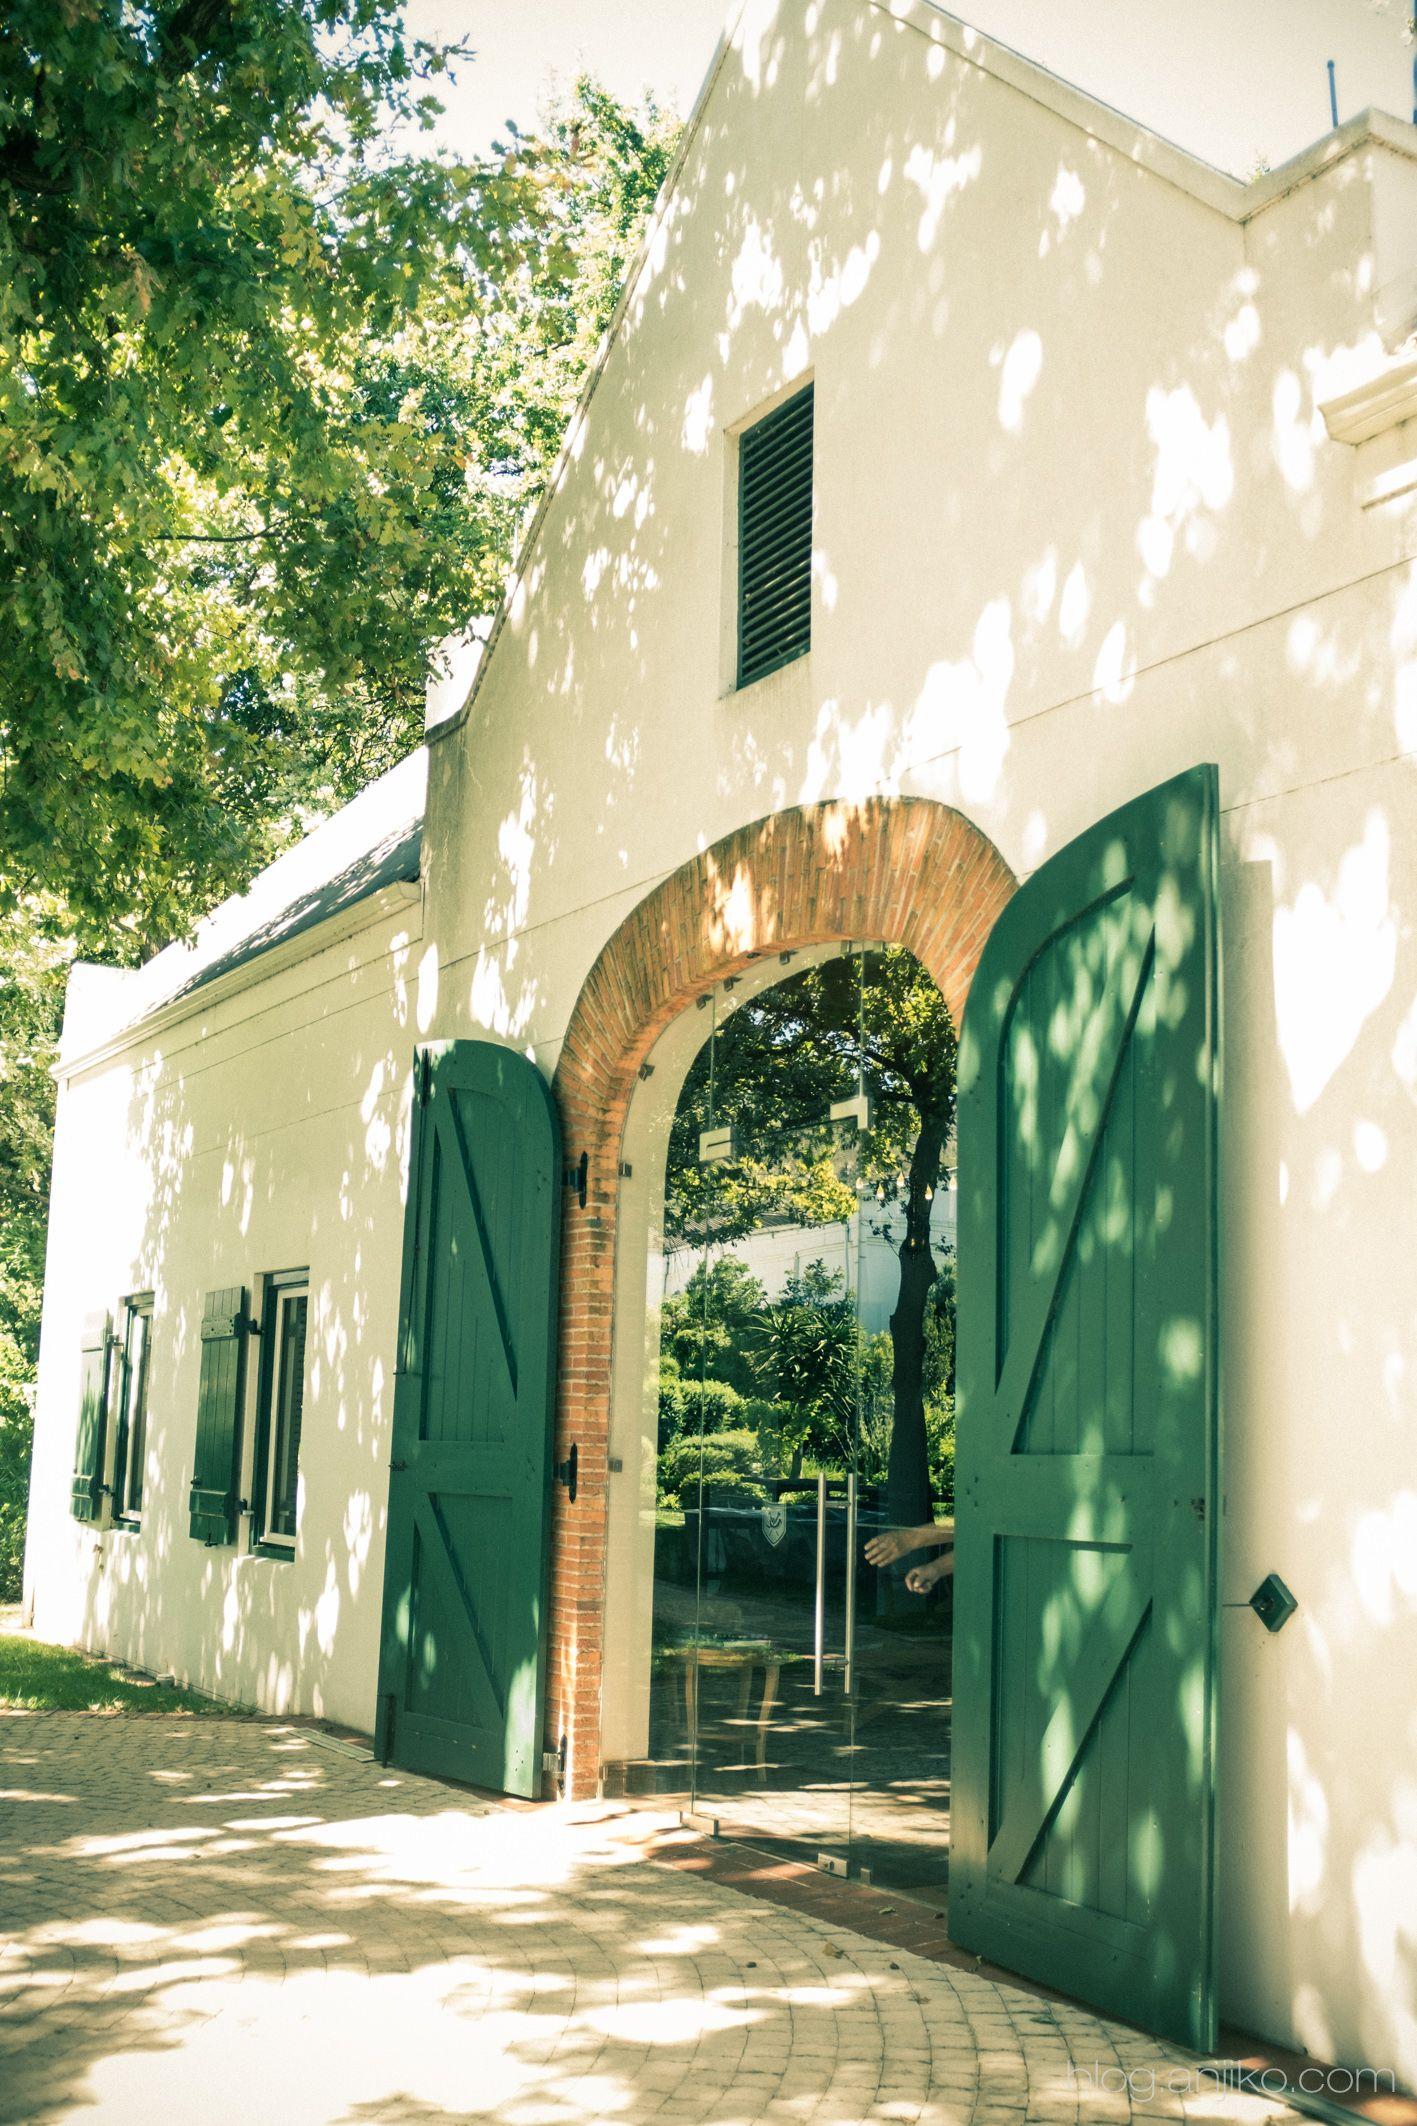 Tipp Weinfarm In Sudafrika La Motte Mit Excellentem Wein Mehr Im Blog Blog Anjiko Com Anjiko Anja Krause Sudafrika Cape Town Wine Winetasting Fransch Sudafrika